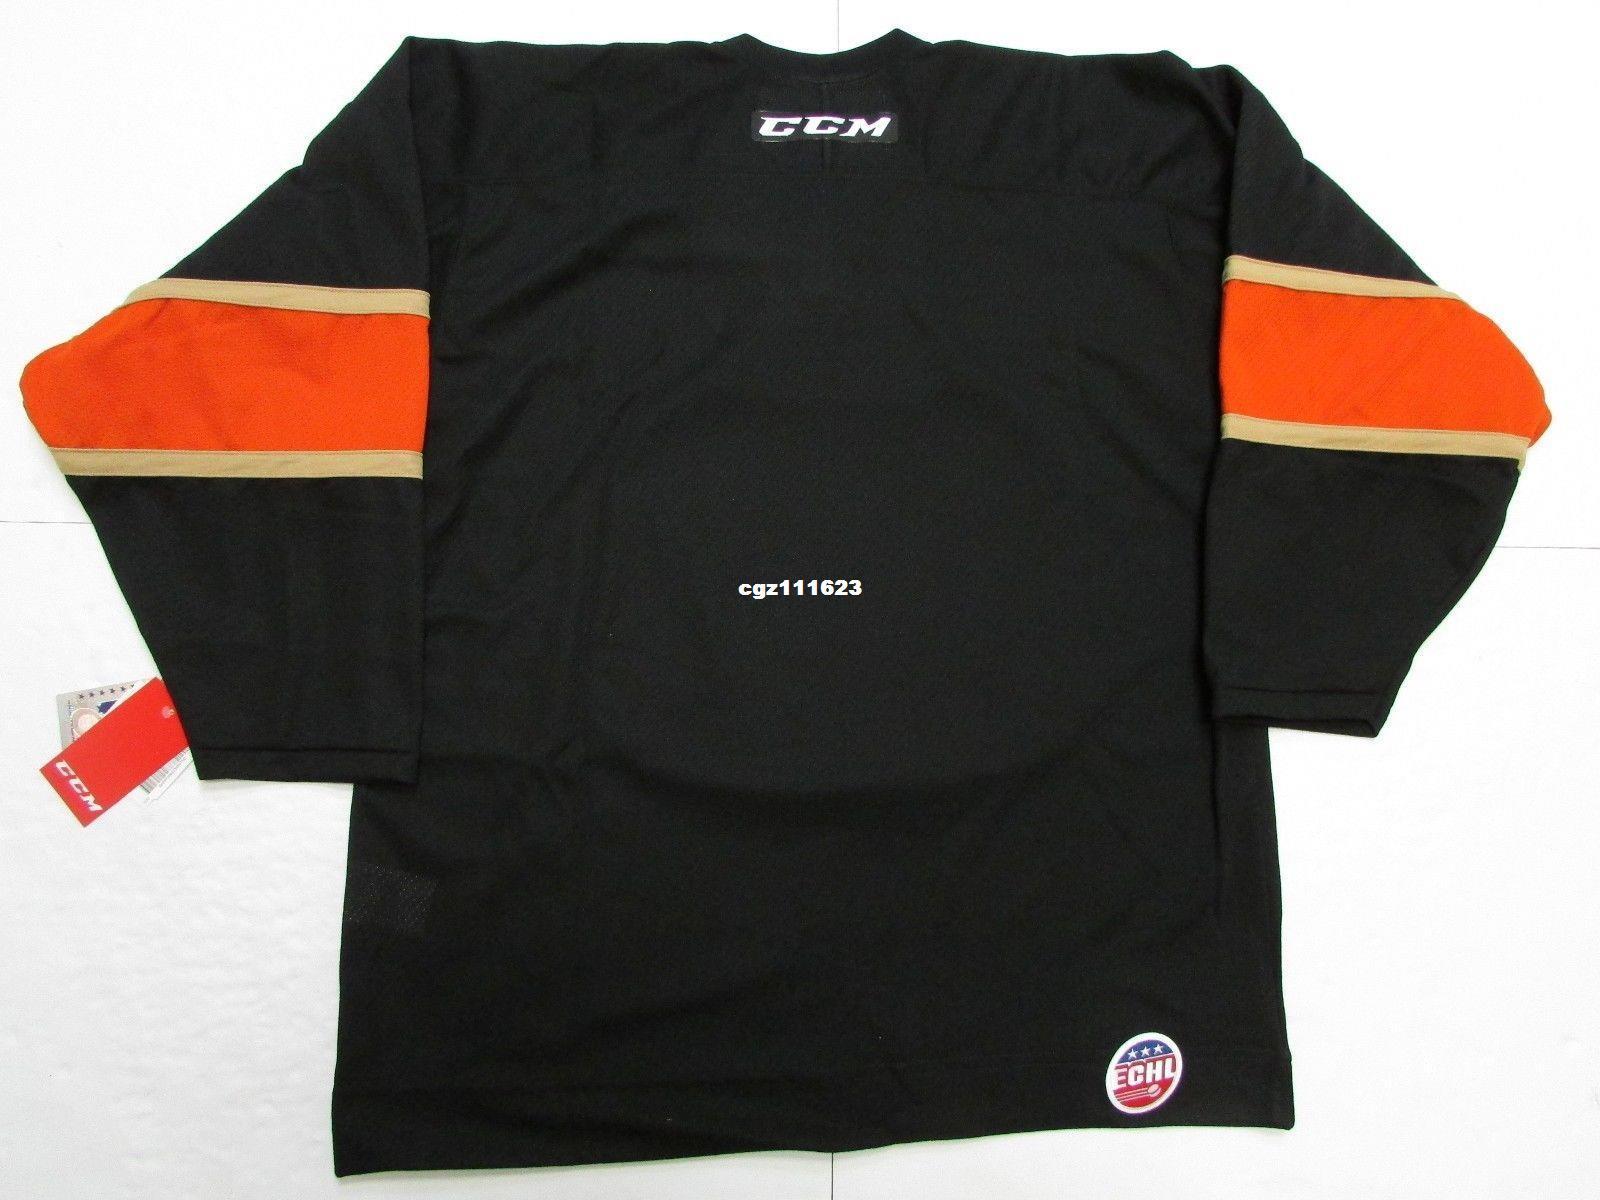 Cheap custom SAN FRANCISCO BULLS BLACK ALTERNATE THIRD ECHL CCM HOCKEY  JERSEY Black Vintage jerseys 6a6f0045f3b